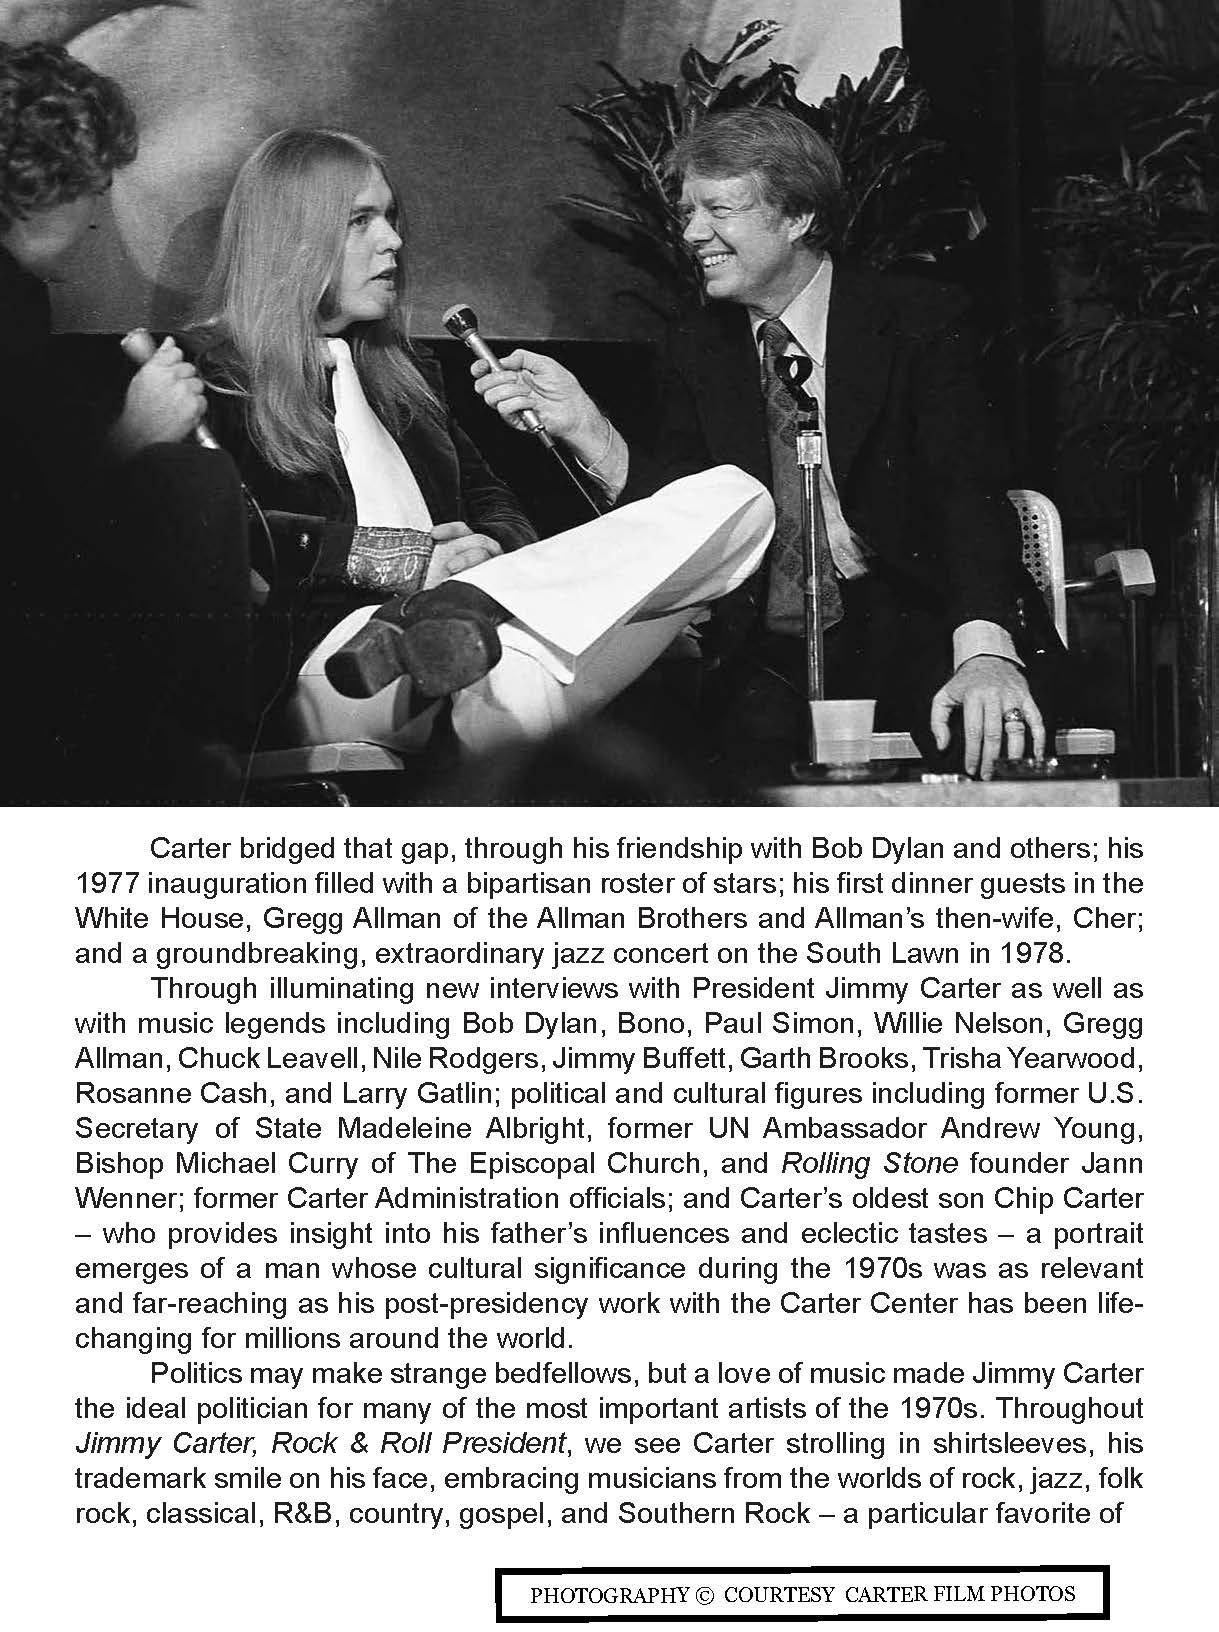 blues-music-online-october-17-2020-dennis-jones-page-18.jpg